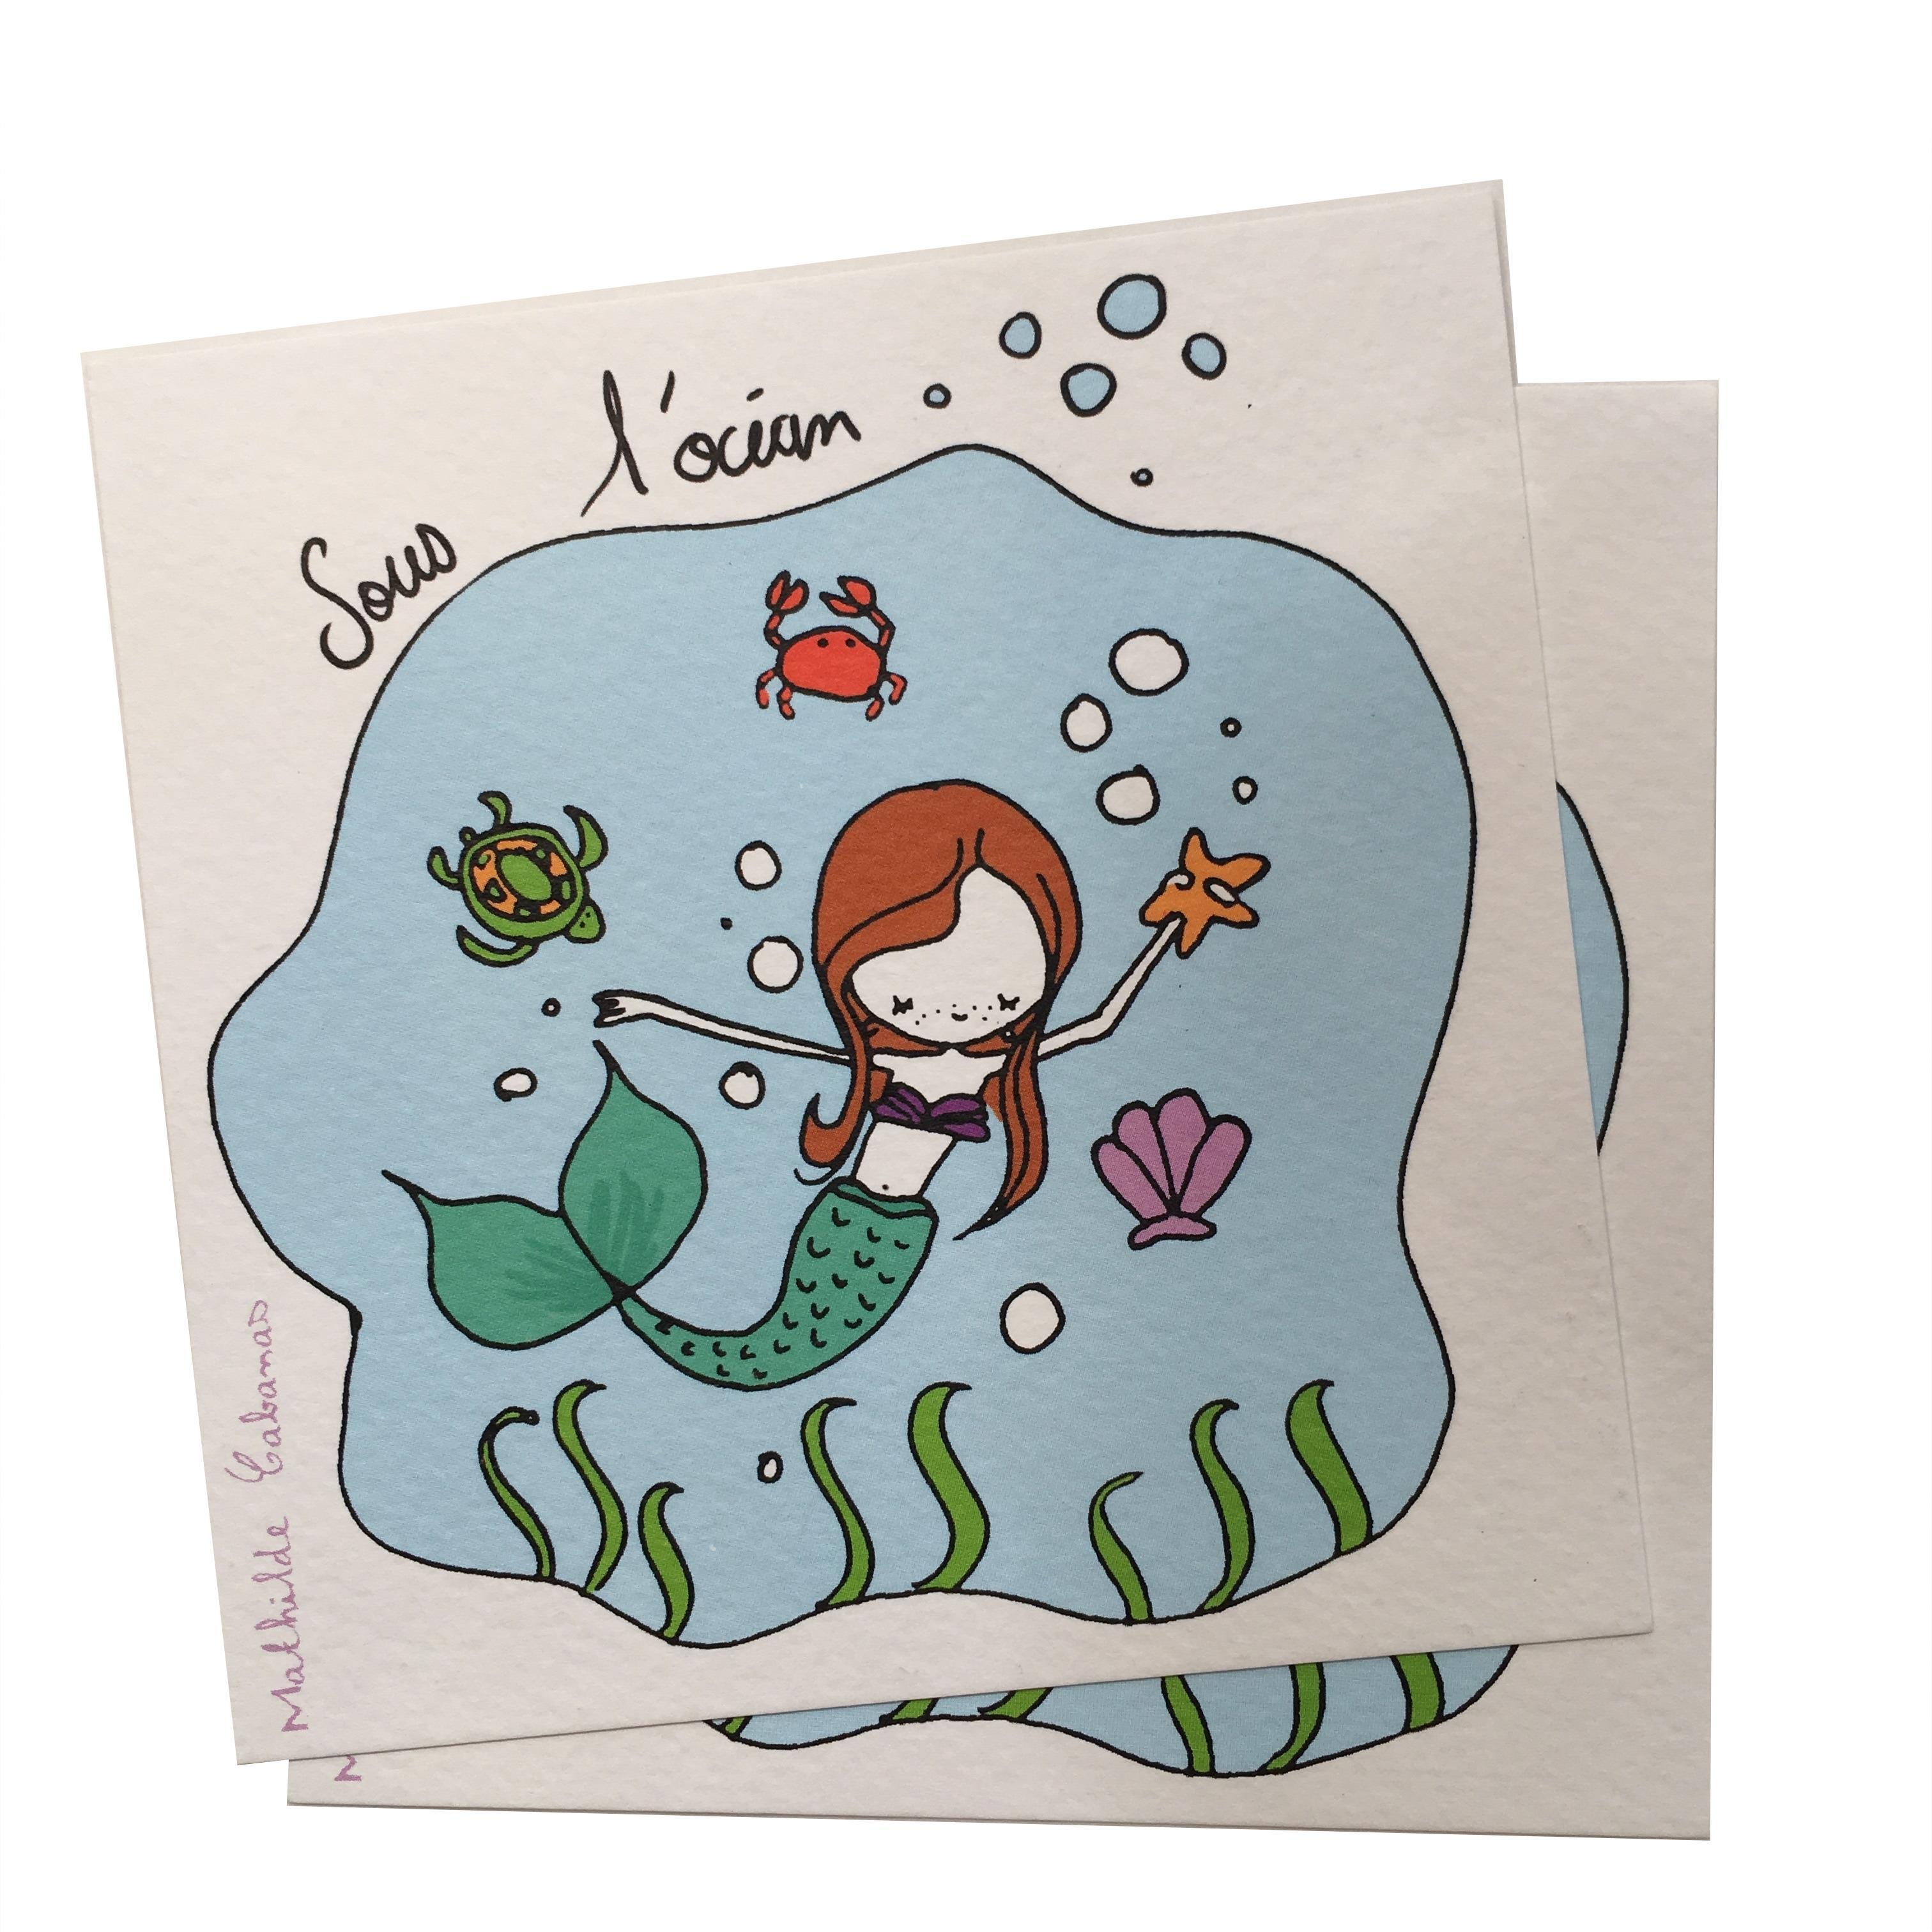 invitation anniversaire sirene x 6 mathilde cabanas - papeterie carton d'invitation - j'aime